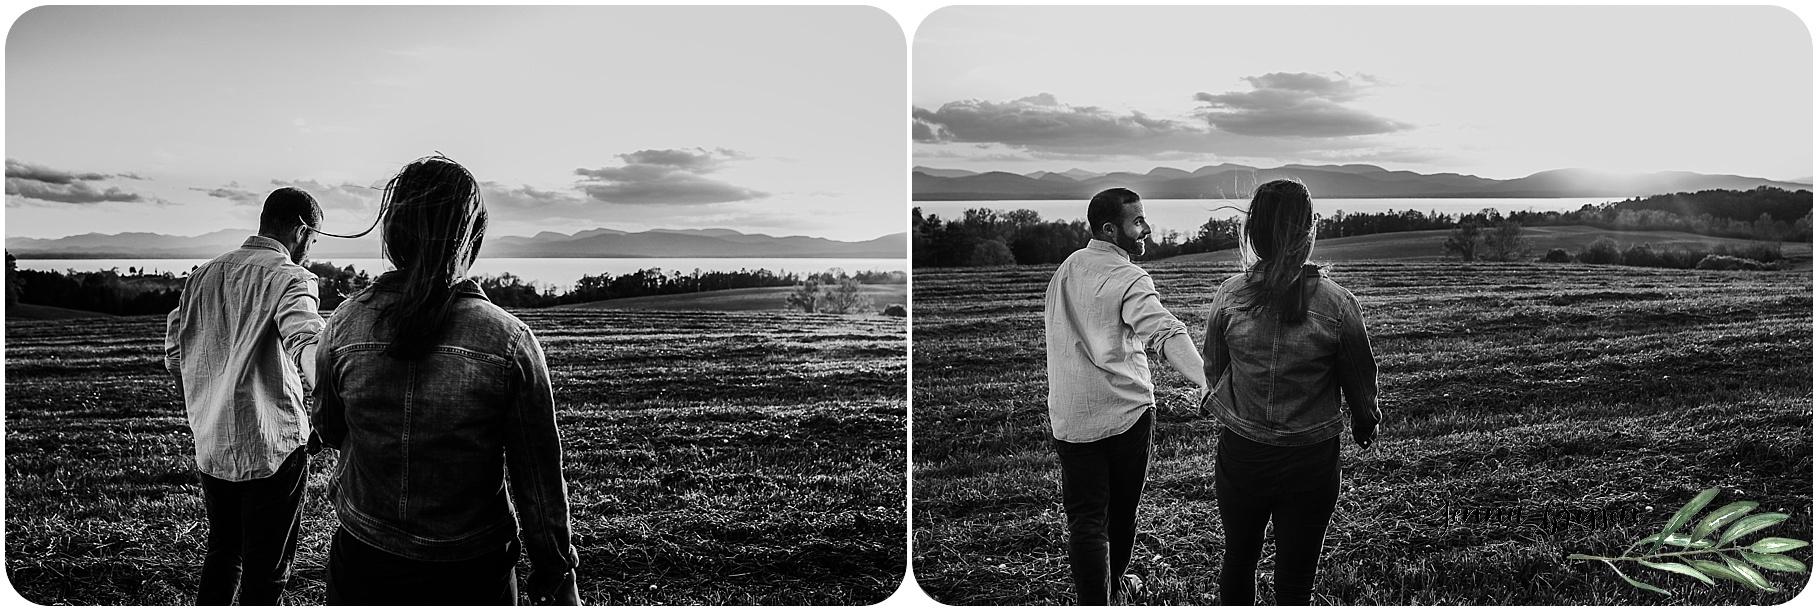 Shelburne Farms Engagement 3 - Jenna Brisson Photography